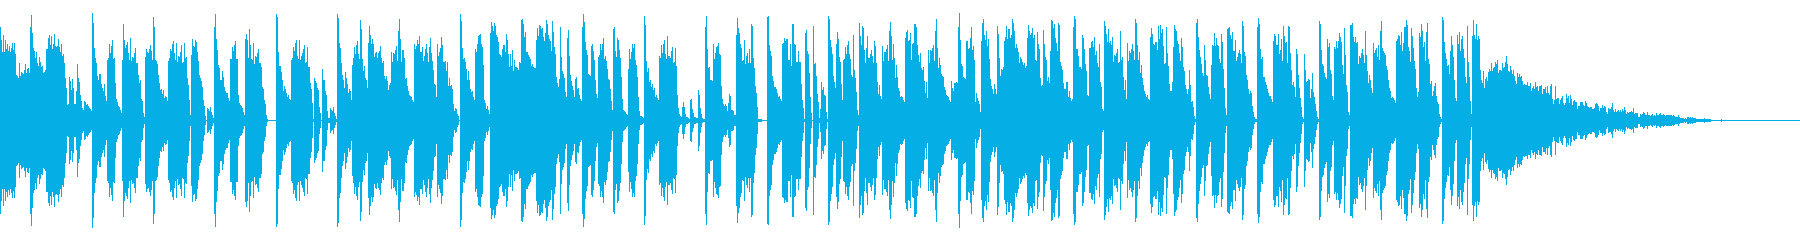 Tonal FX、140 BPMの再生済みの波形